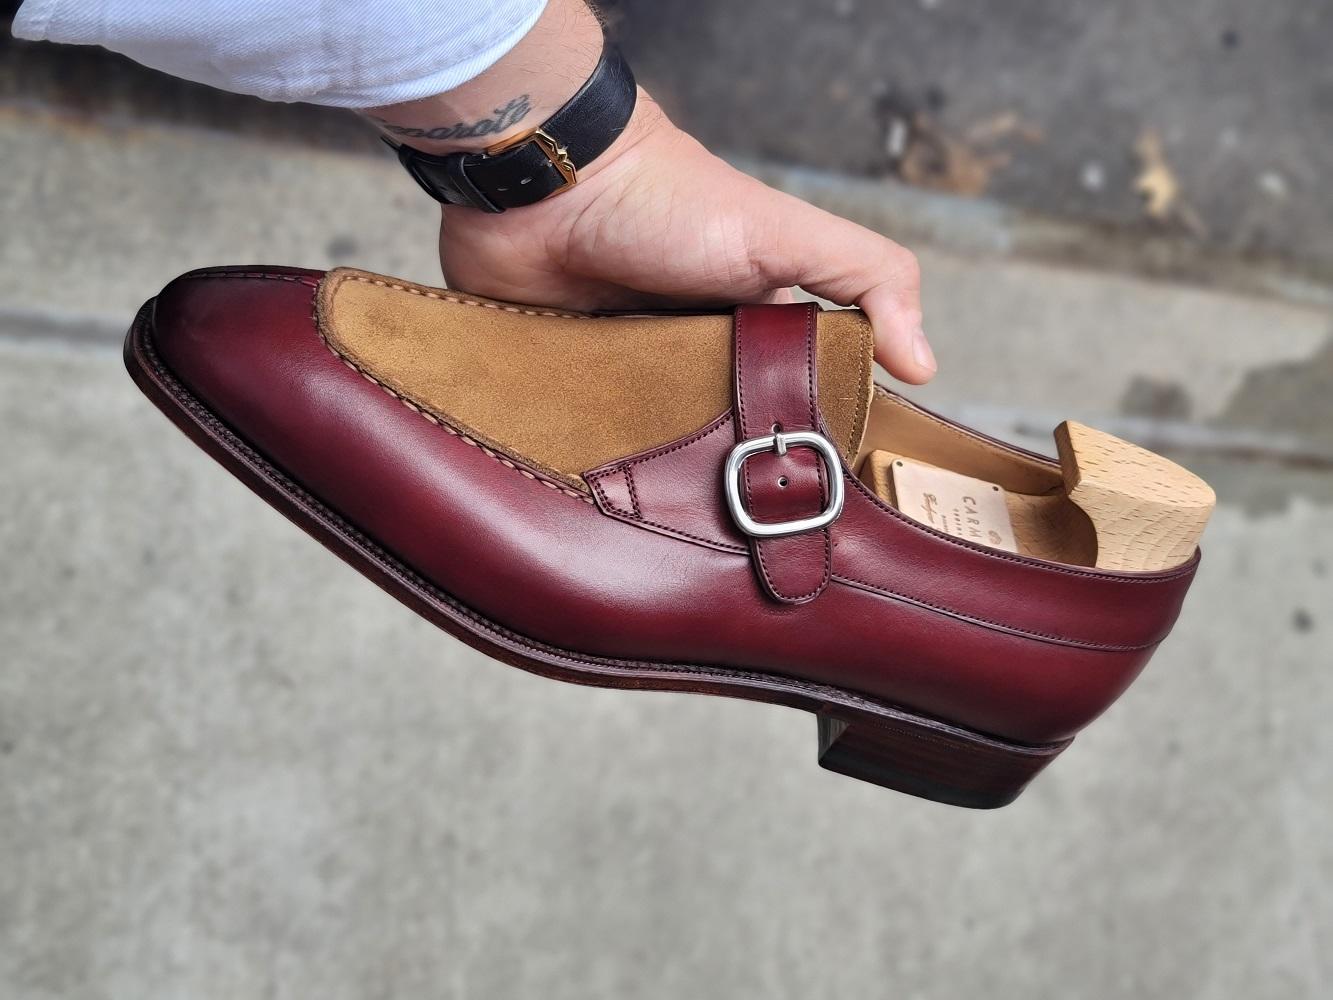 Carmina x The Shoe Snob - New GMTO On Offer!